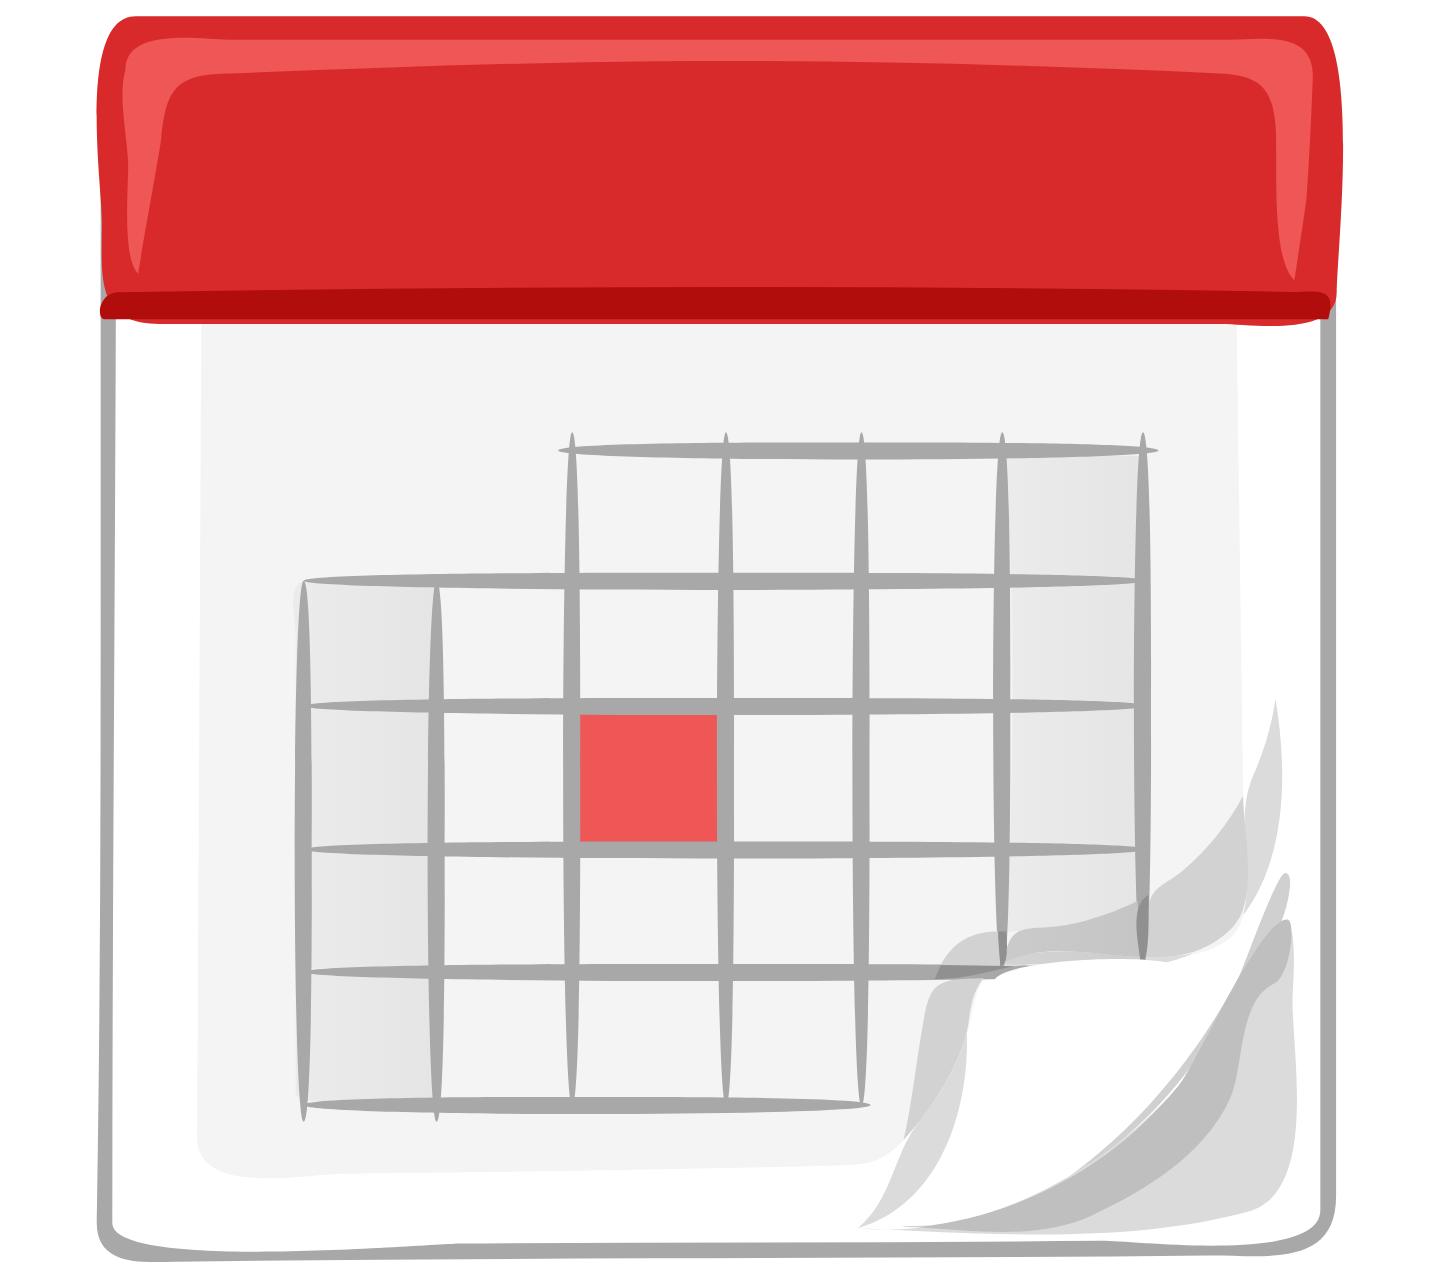 Image of a calendar to run a monthly employee referral bonus raffle